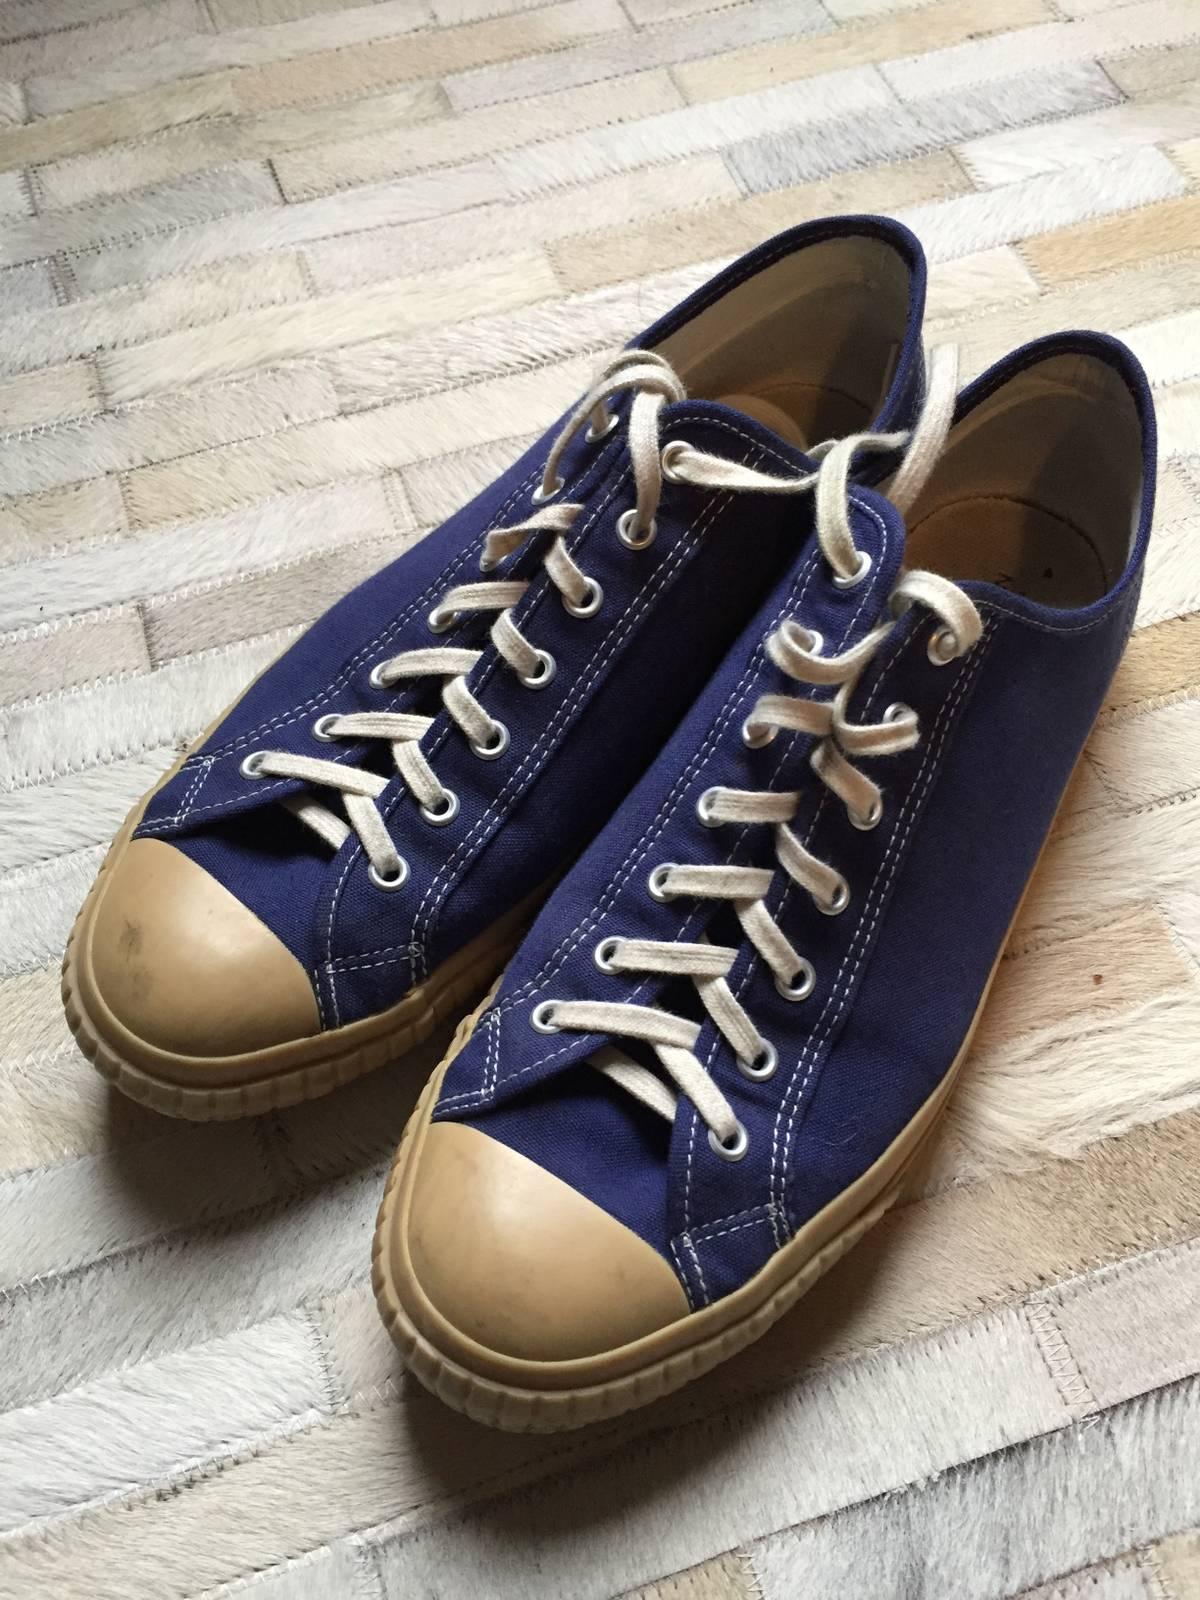 5e660c1b2dda0 John Lofgren Champion Sneakers Navy Size 9 - Low-Top Sneakers for Sale -  Grailed